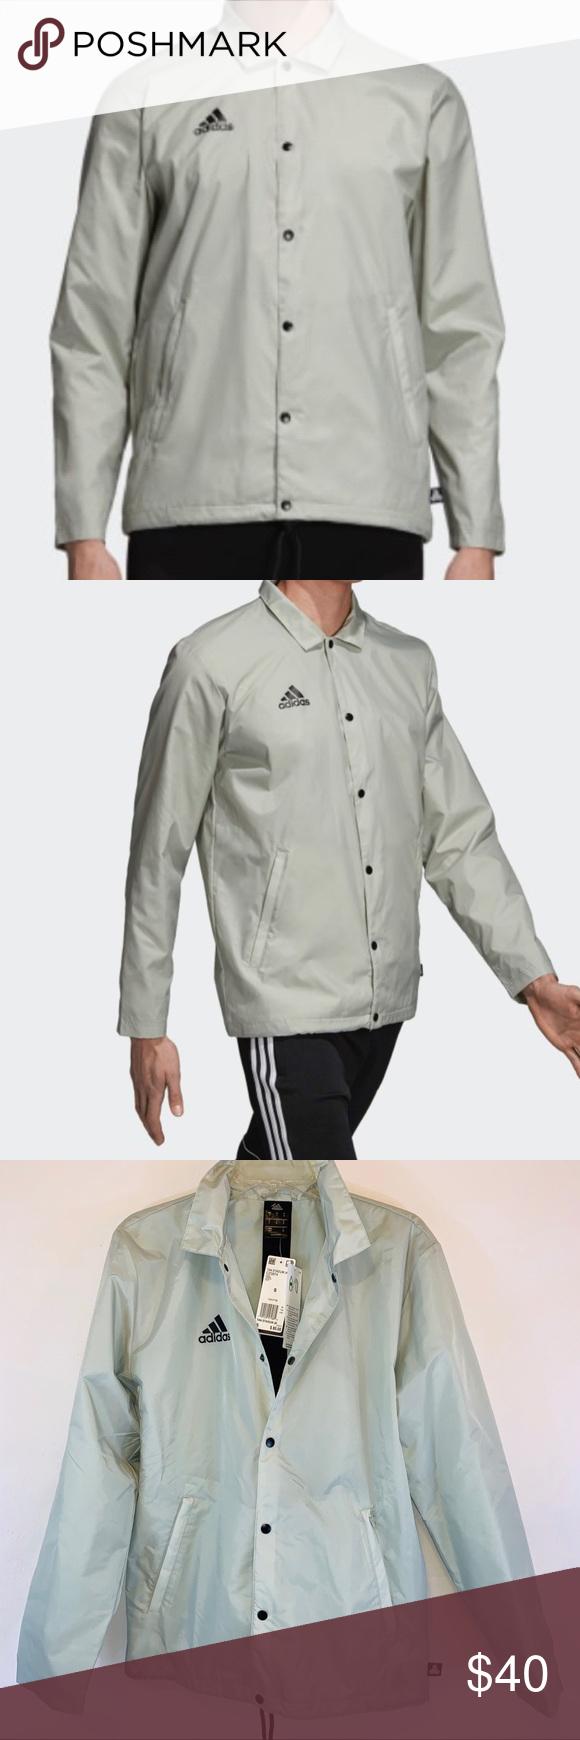 Adidas Tango Tan Stadium Jacket NWT Regular fit is wider at